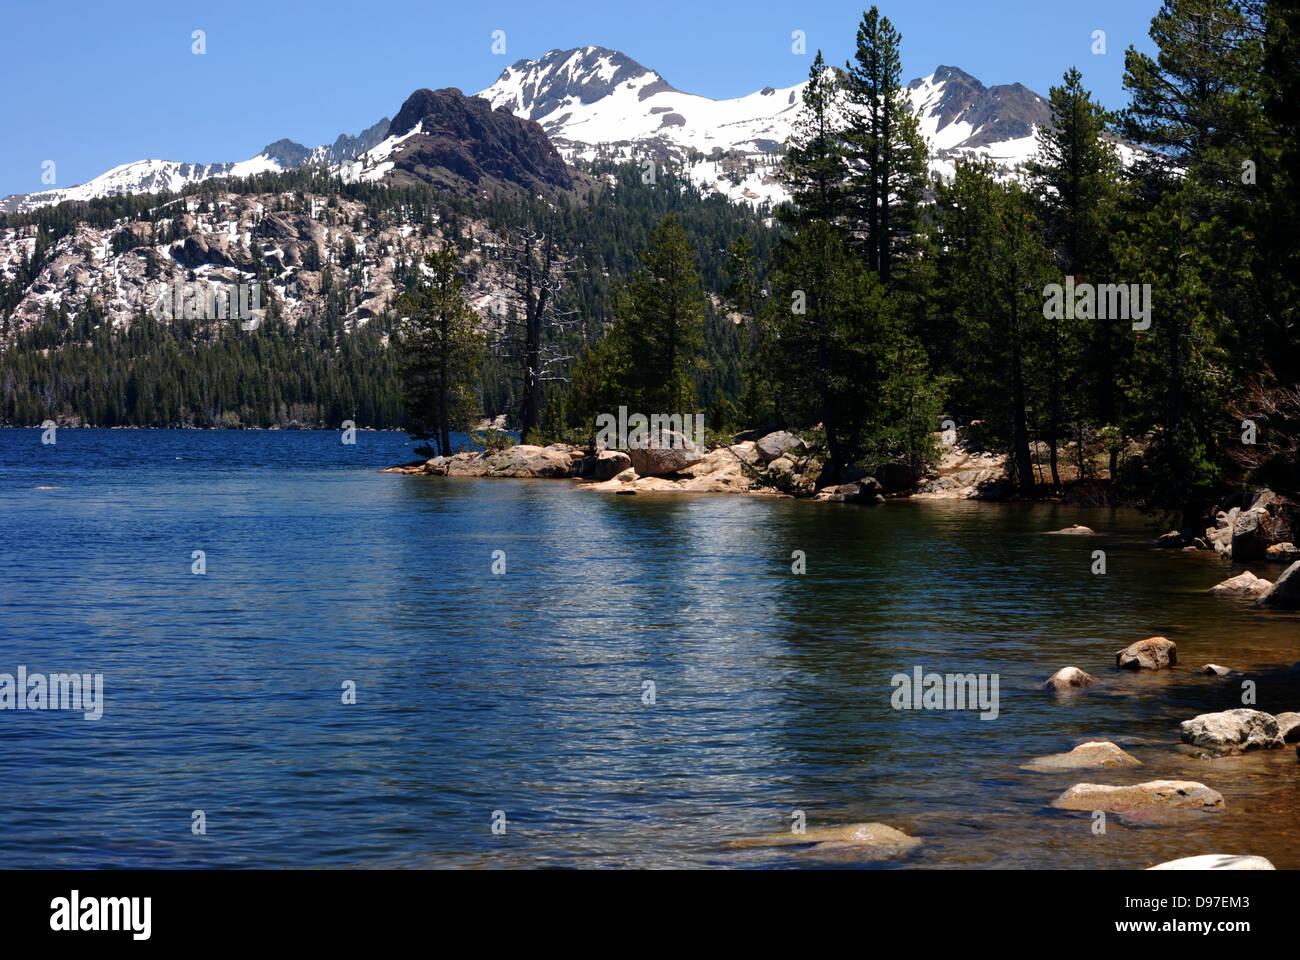 Caples lake near kirkwood california stock photo for Kirkwood login